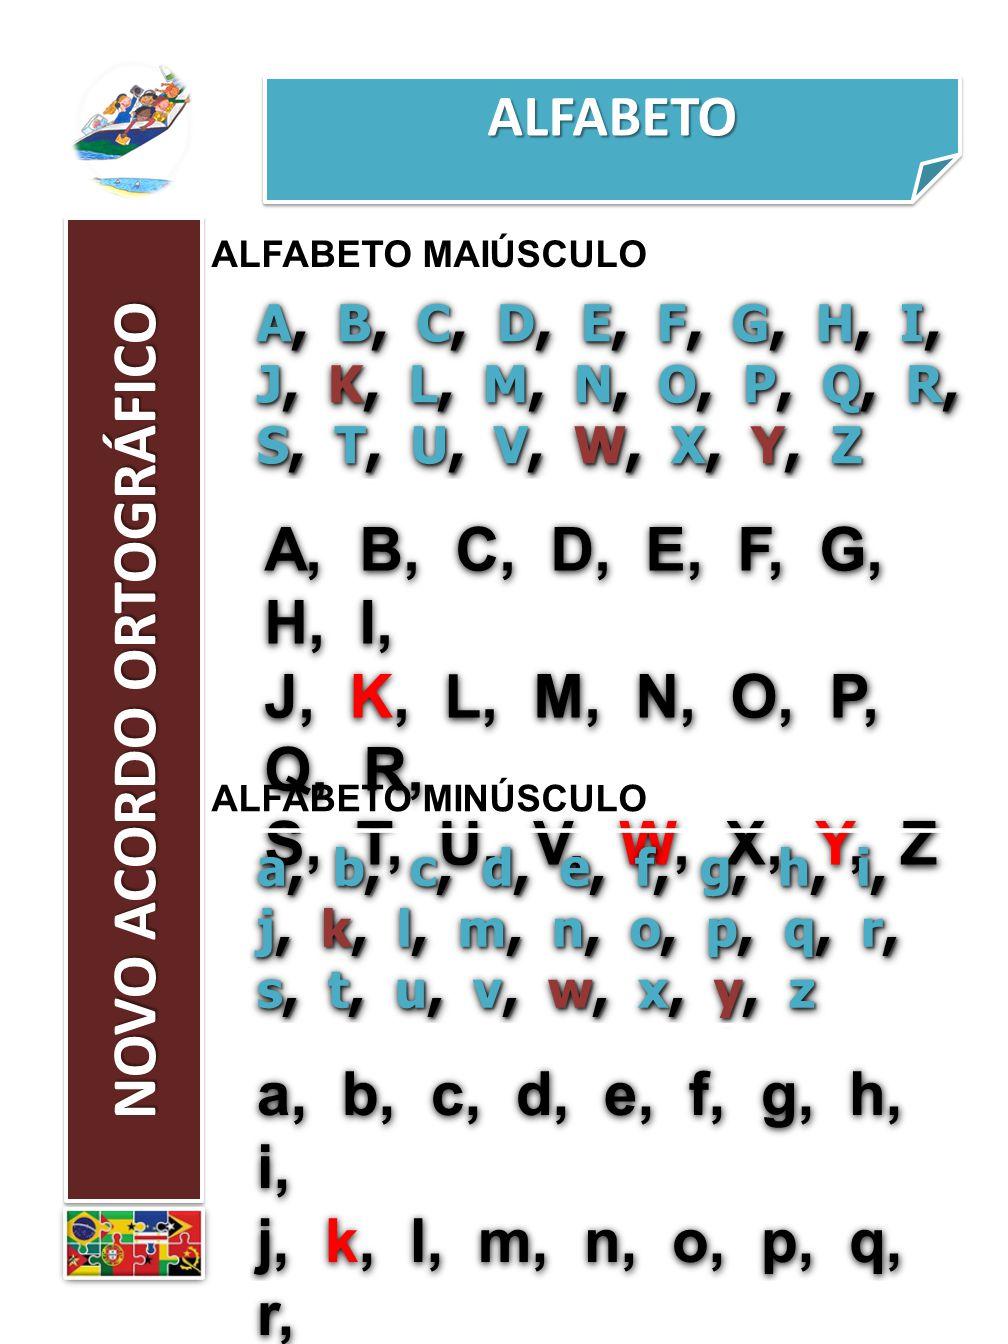 ALFABETOALFABETO NOVO ACORDO ORTOGRÁFICO ALFABETO MAIÚSCULO A, B, C, D, E, F, G, H, I, J, K, L, M, N, O, P, Q, R, S, T, U, V, W, X, Y, Z A, B, C, D, E